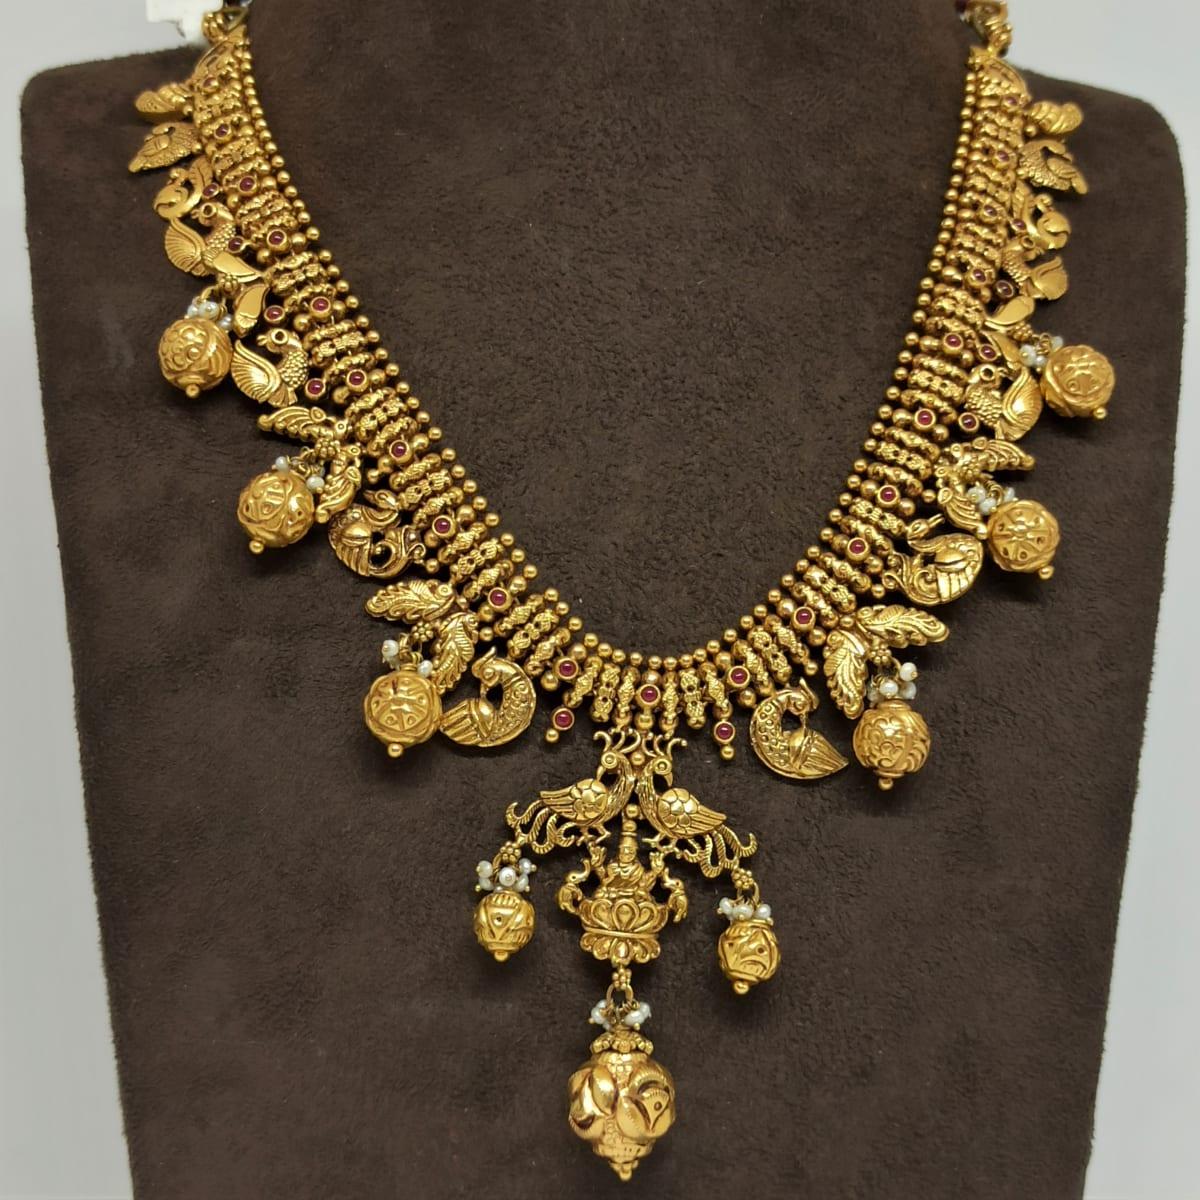 Maahira Antique Necklace